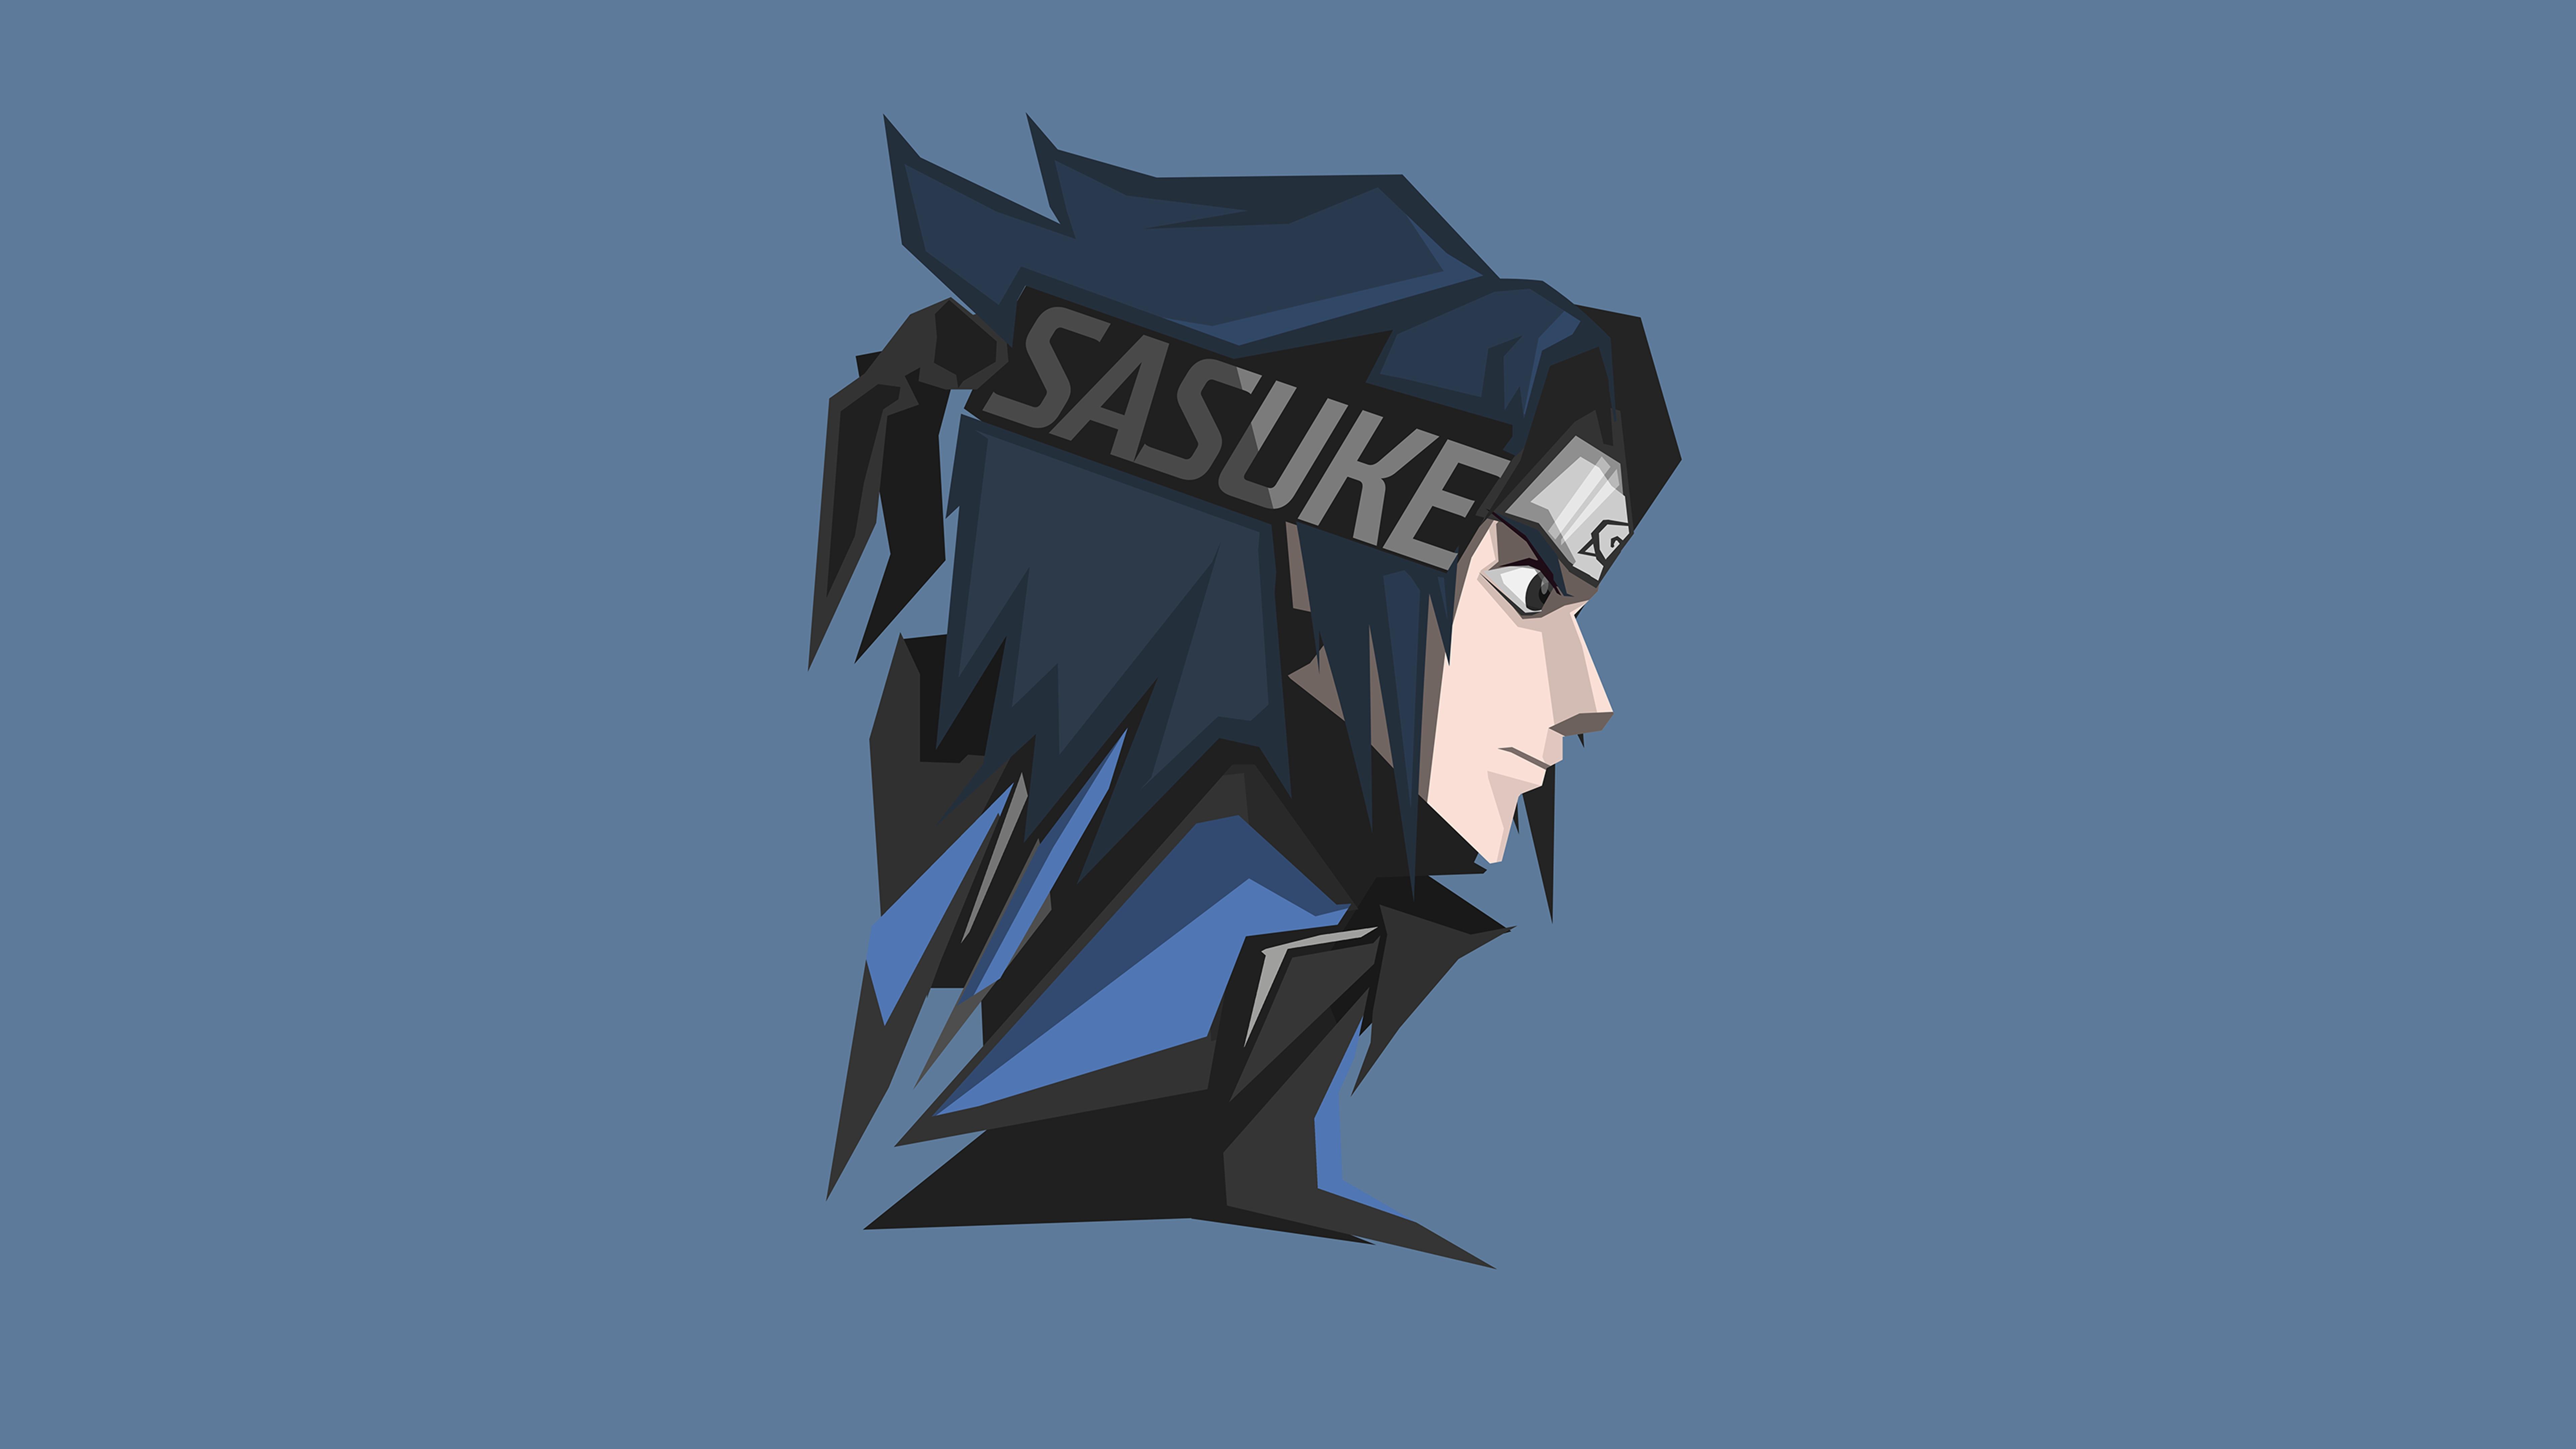 Sasuke Uchiha Illustration Anime Wallpaper 8k Ultra Hd Id 3632